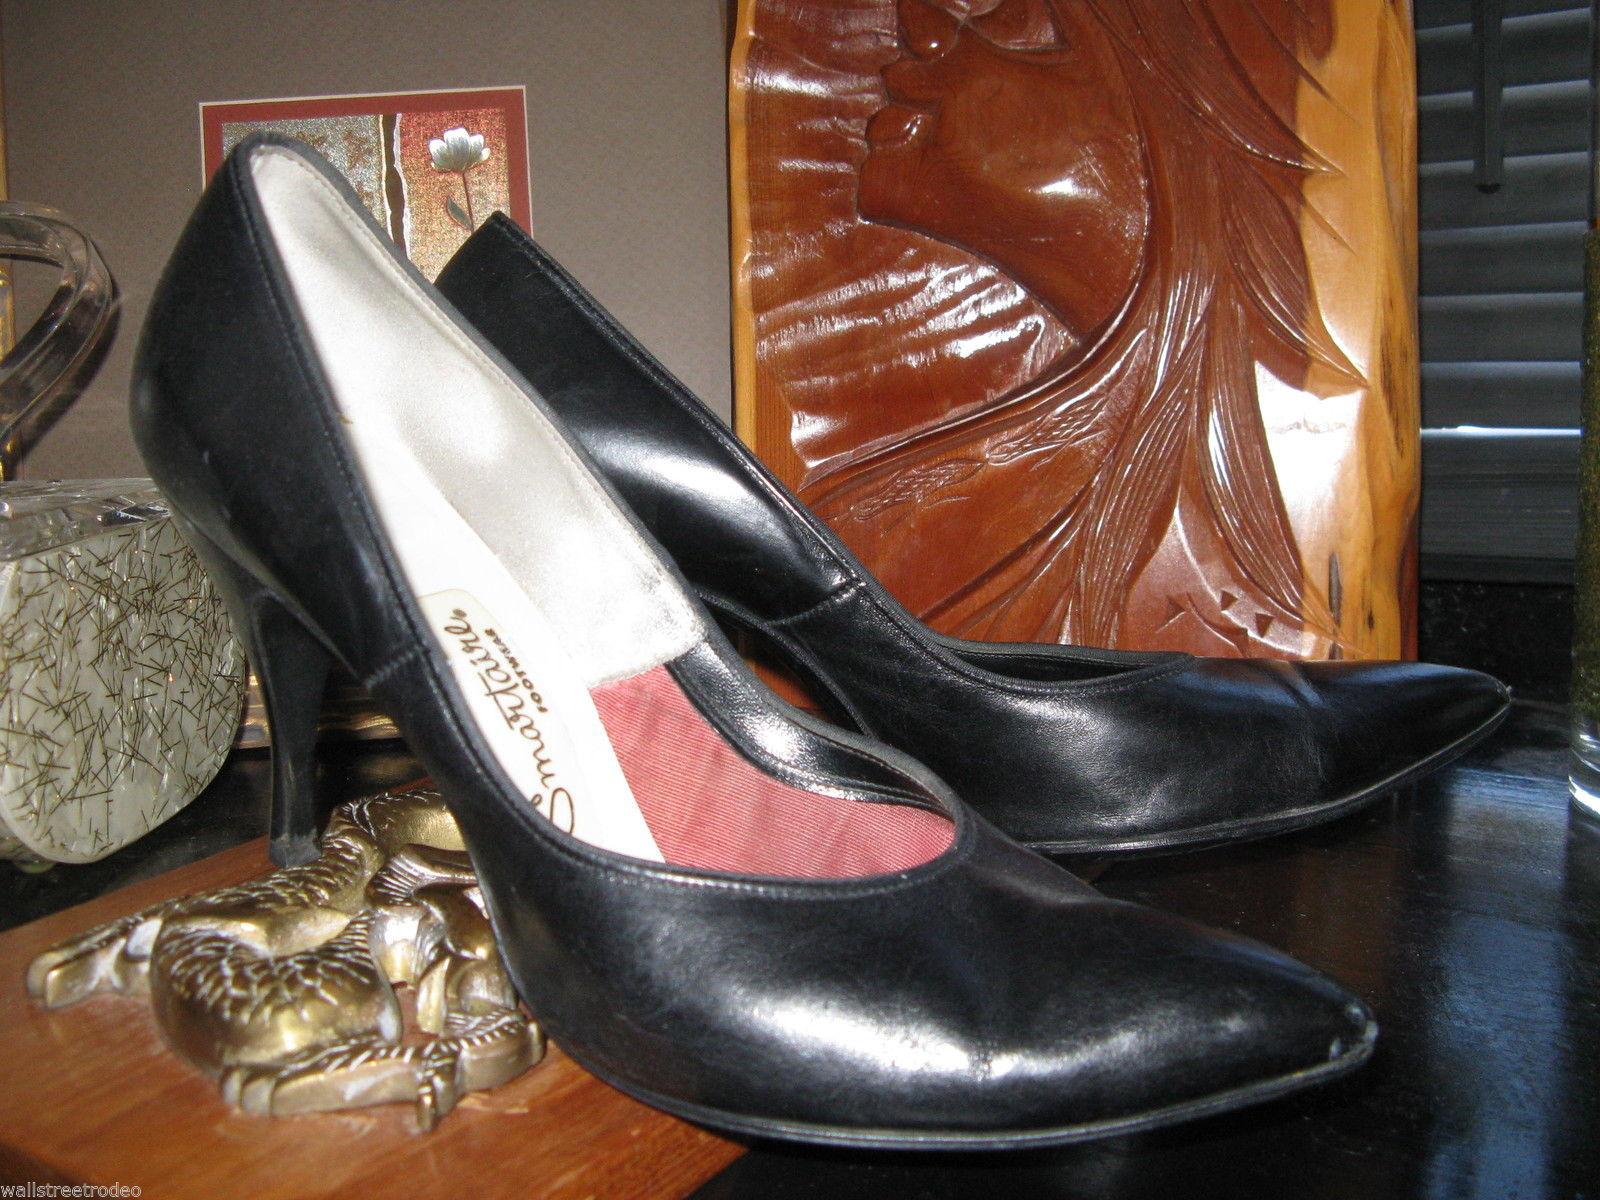 Smartaire vintage Debbie Renolds heels shoes 7 1/2 AAAA VLV 6 UK3.5 36 bonus VLV